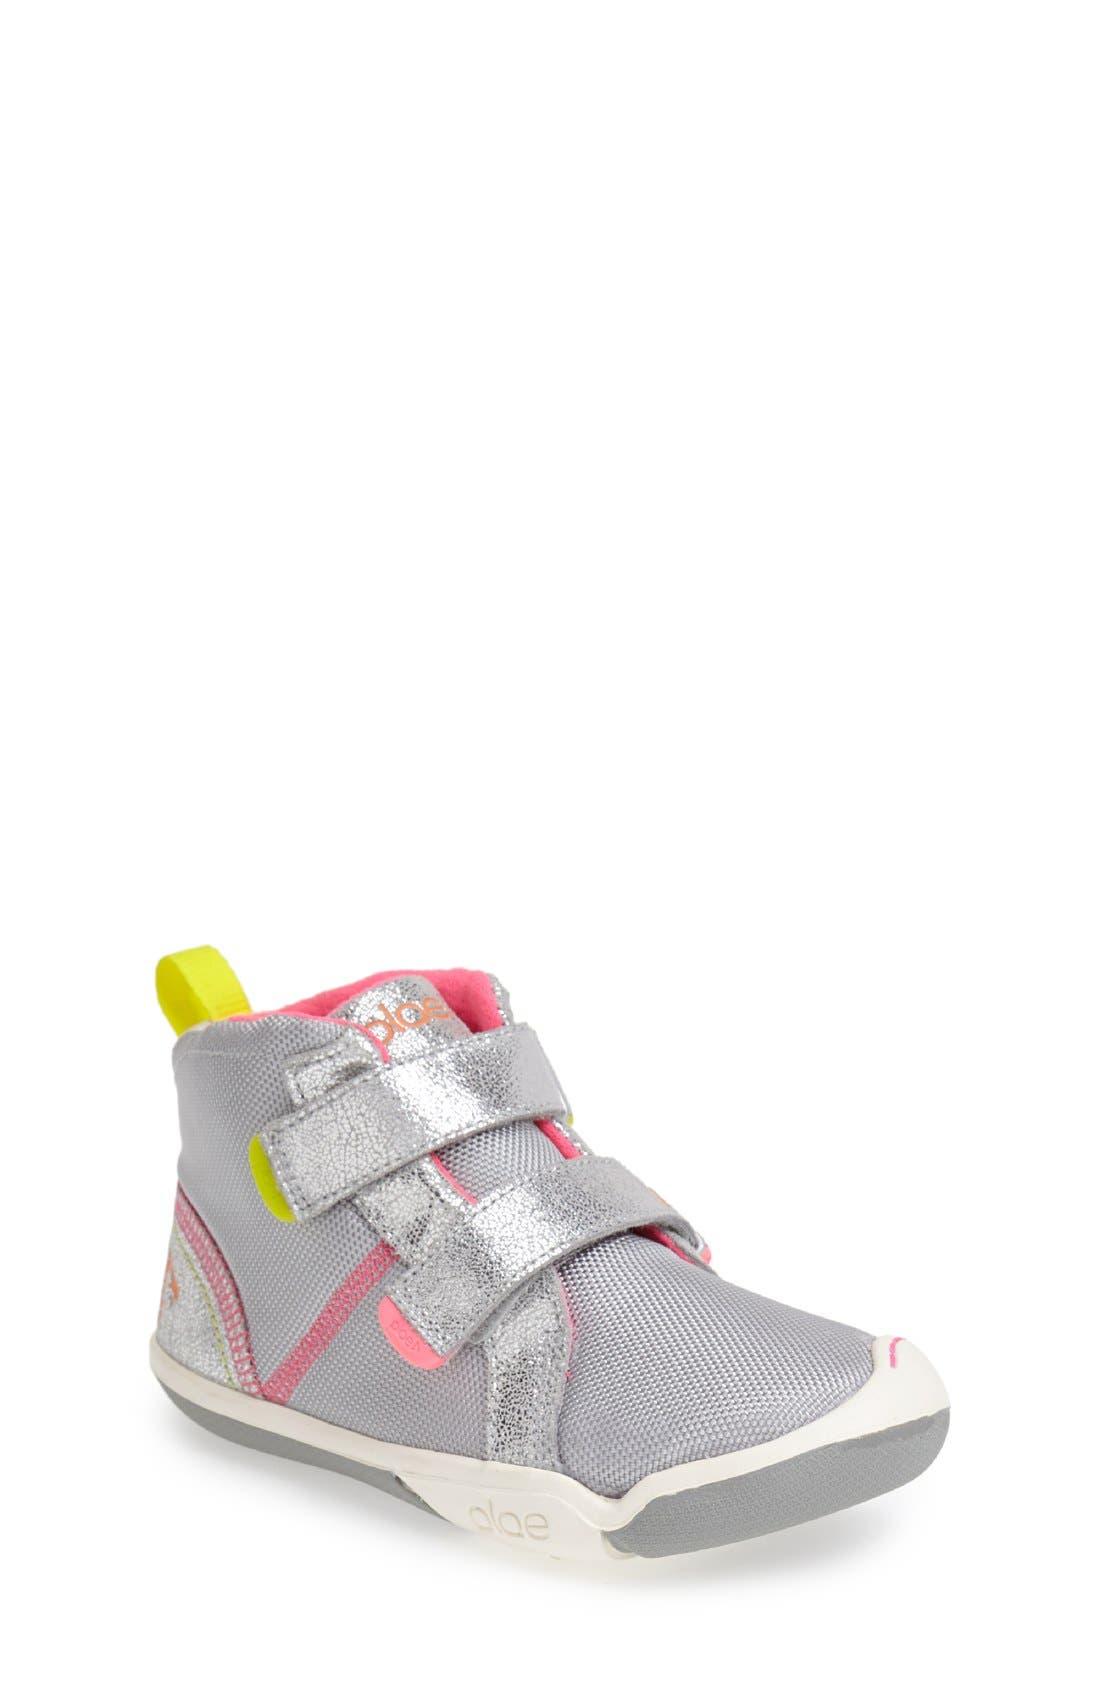 'Max' Customizable High Top Sneaker,                         Main,                         color, 040